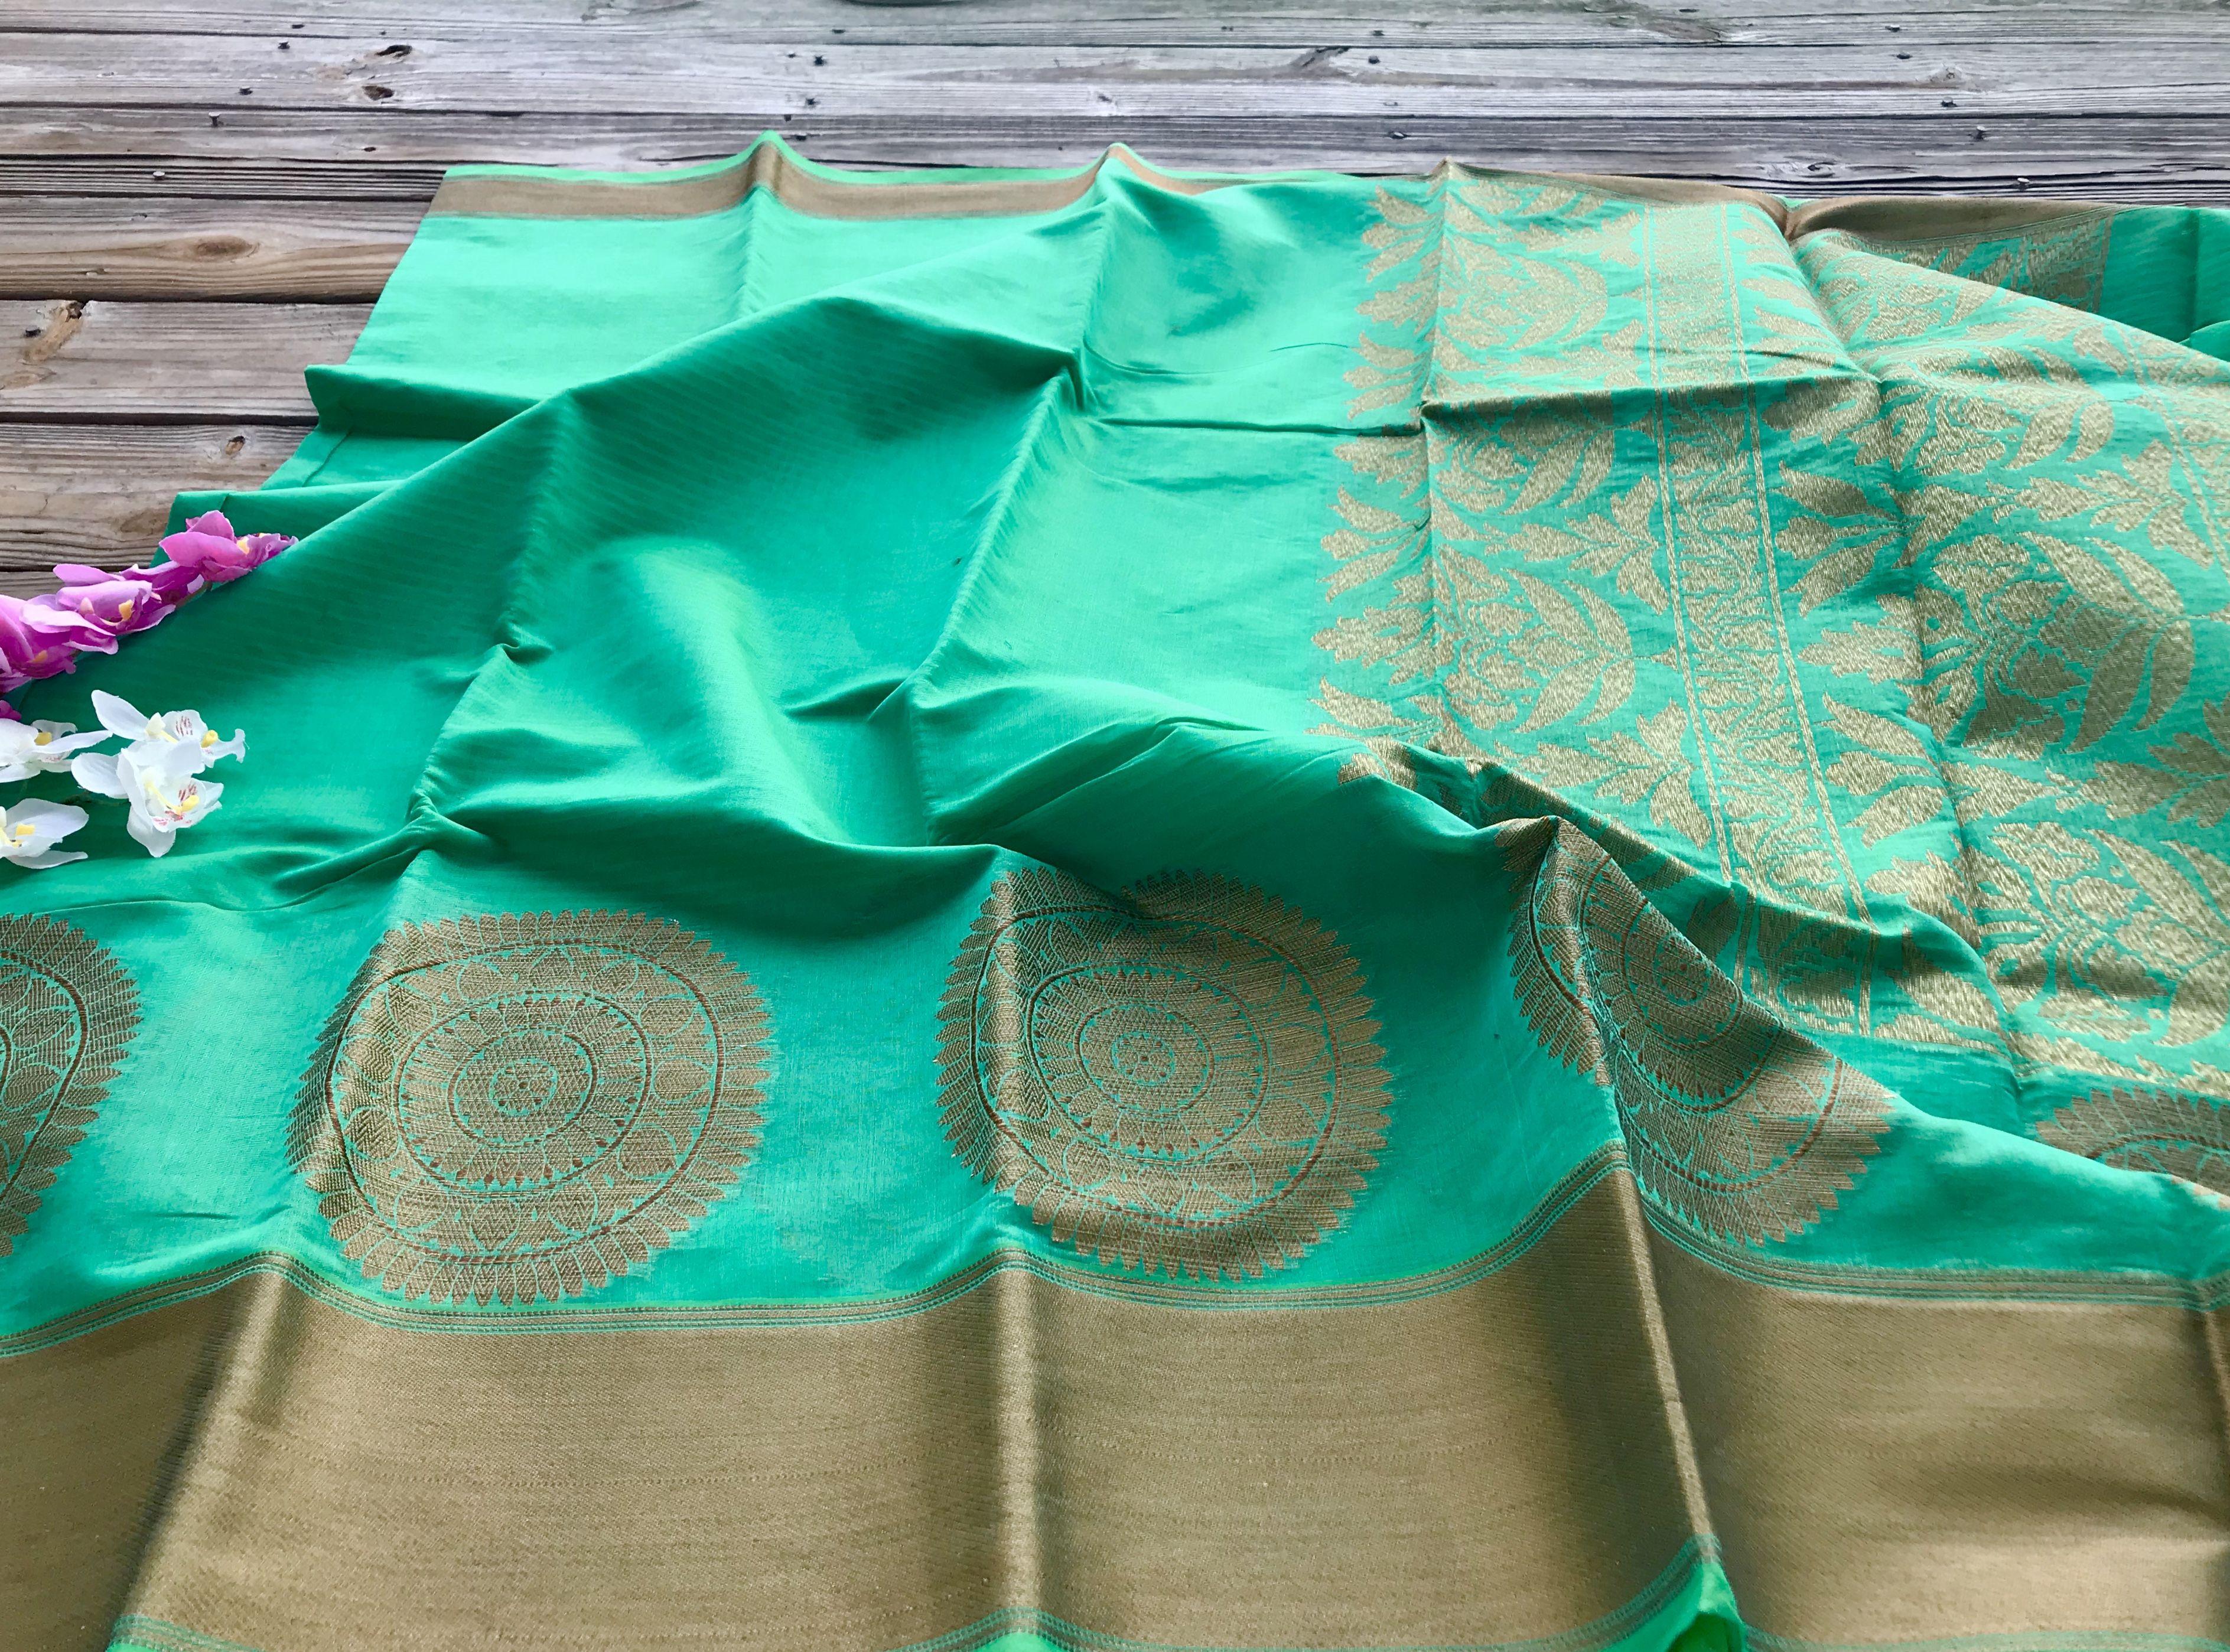 Pure Cotton Banarasi Saree in Sea Green and Gold